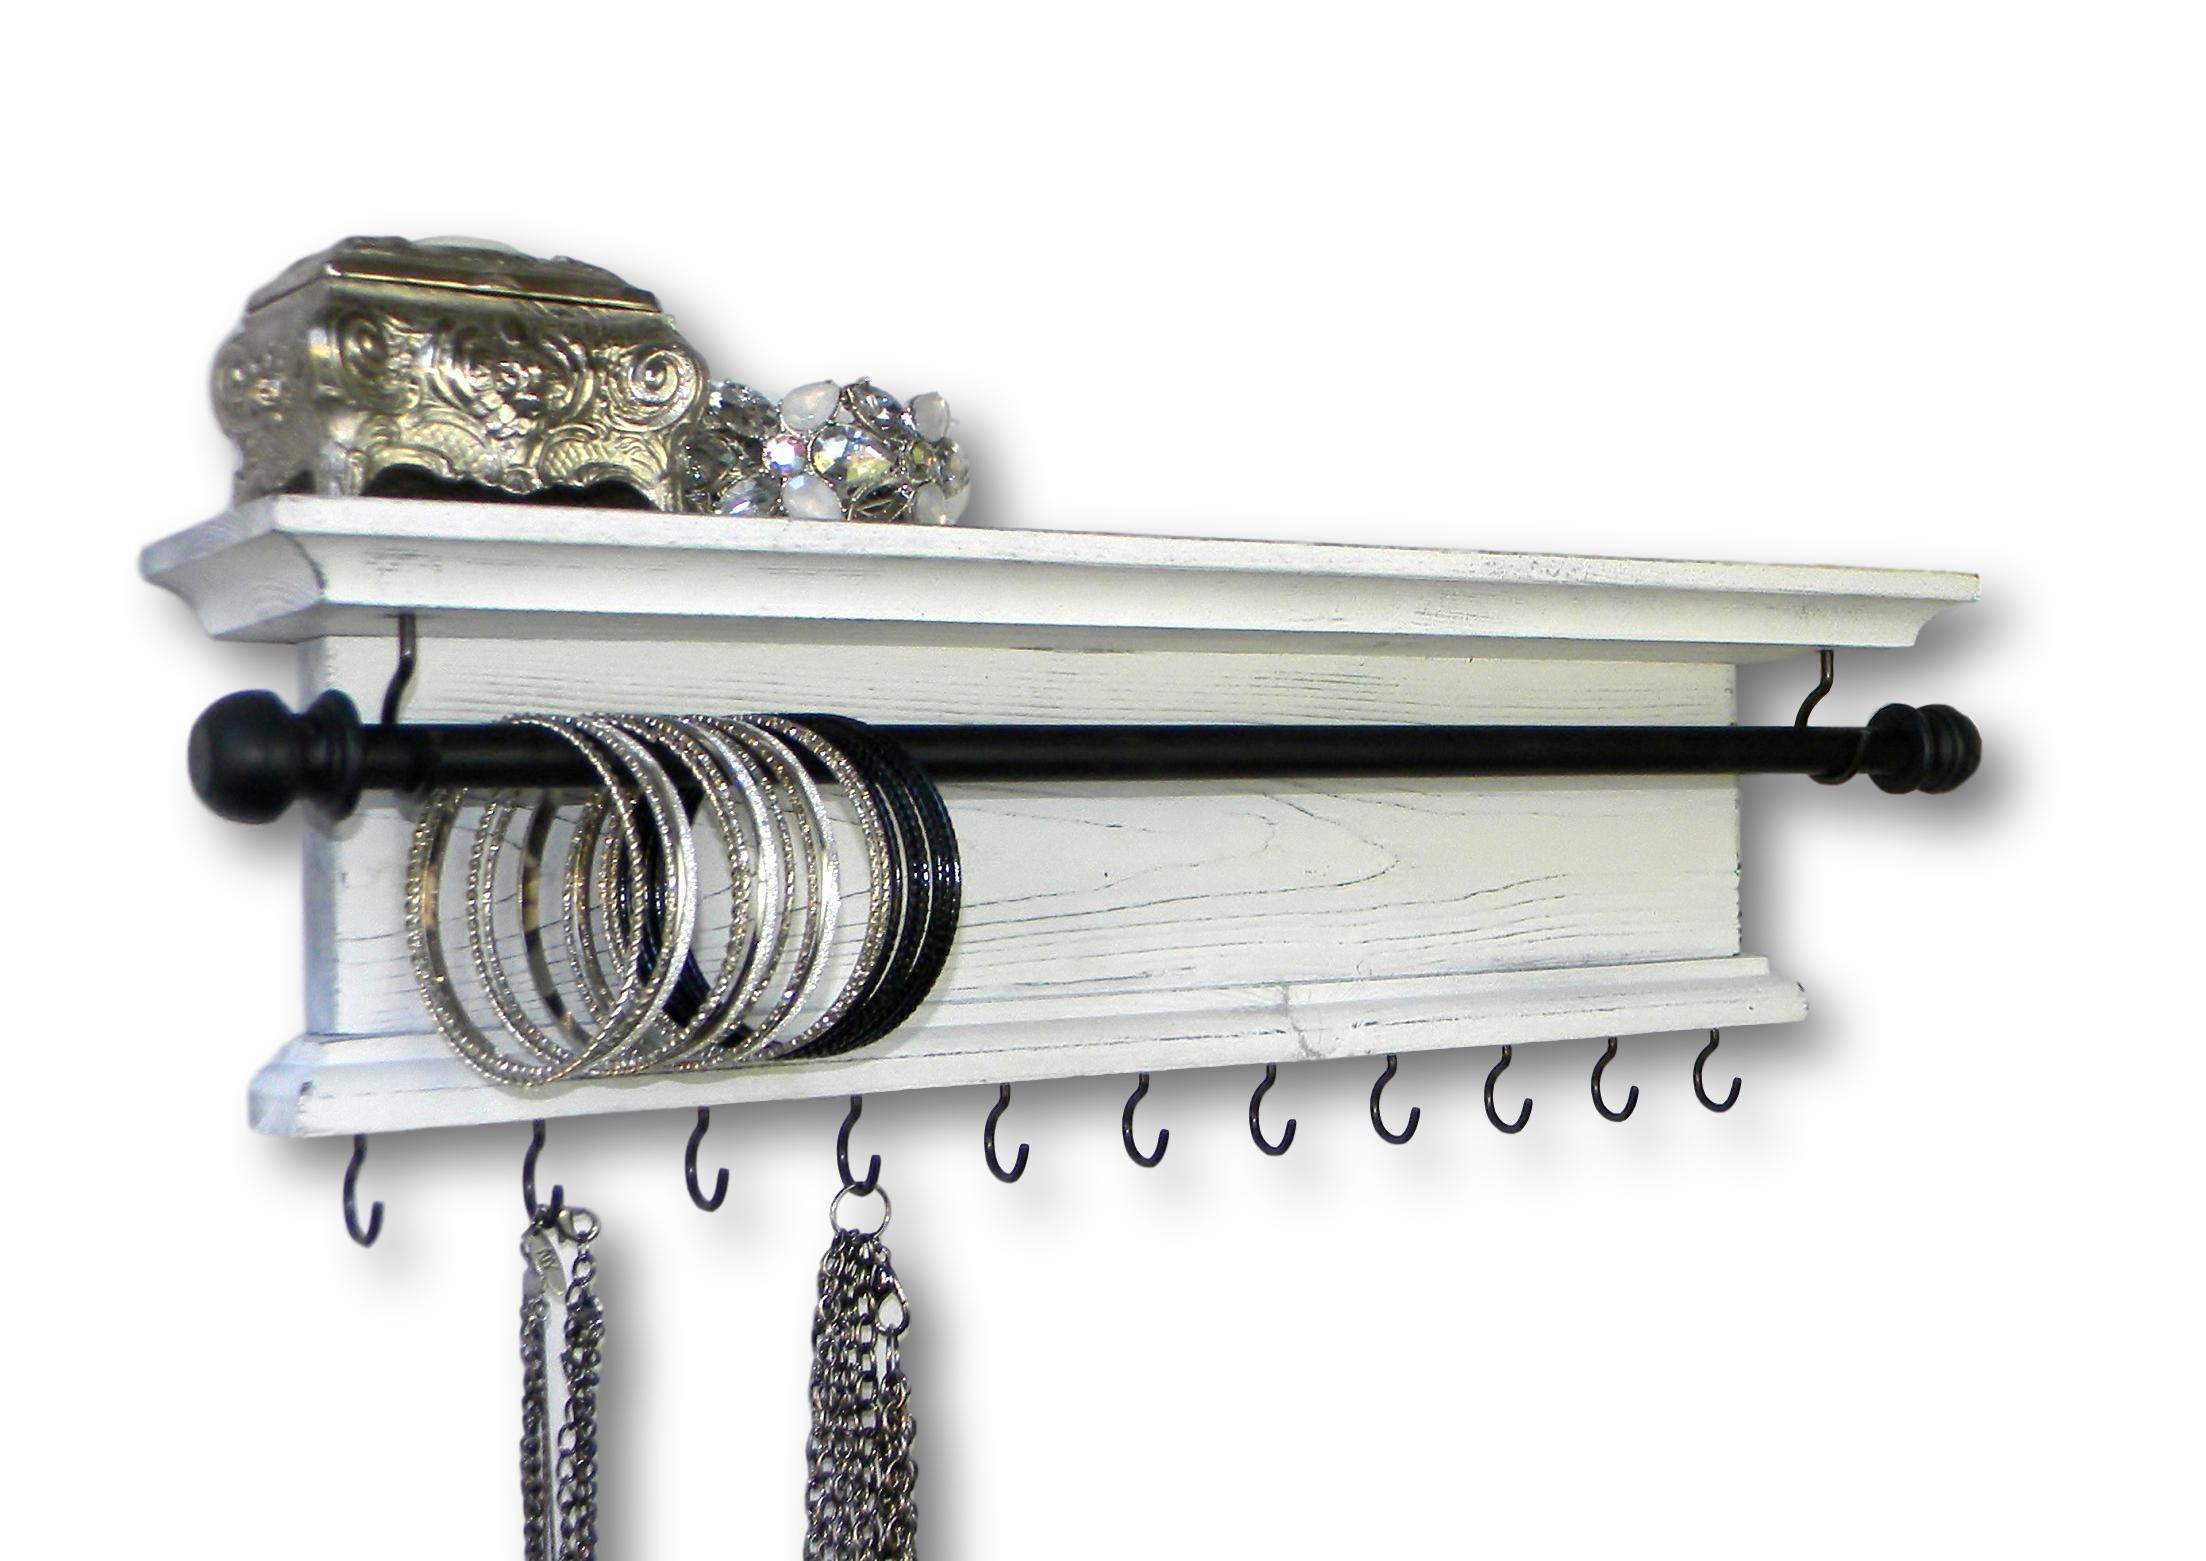 Modern Rustic Wood Bracelet Bangle Necklace Jewelry Holder 18'' Wall Mounted Wall Shelf (Distressed White)